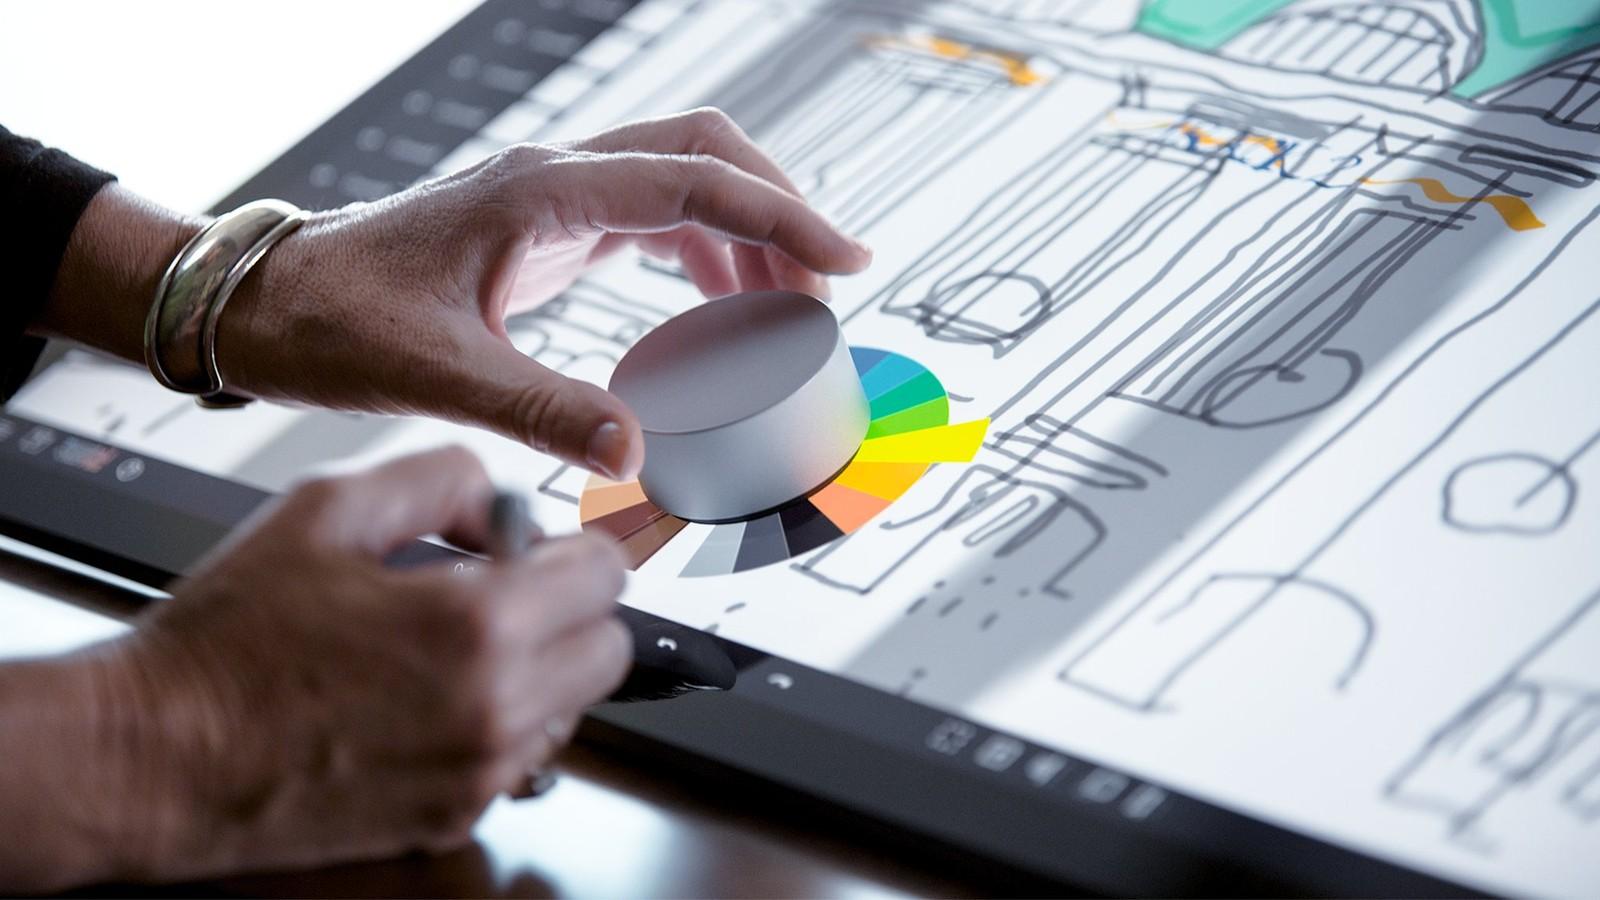 microsoft-surface-studio-stylus